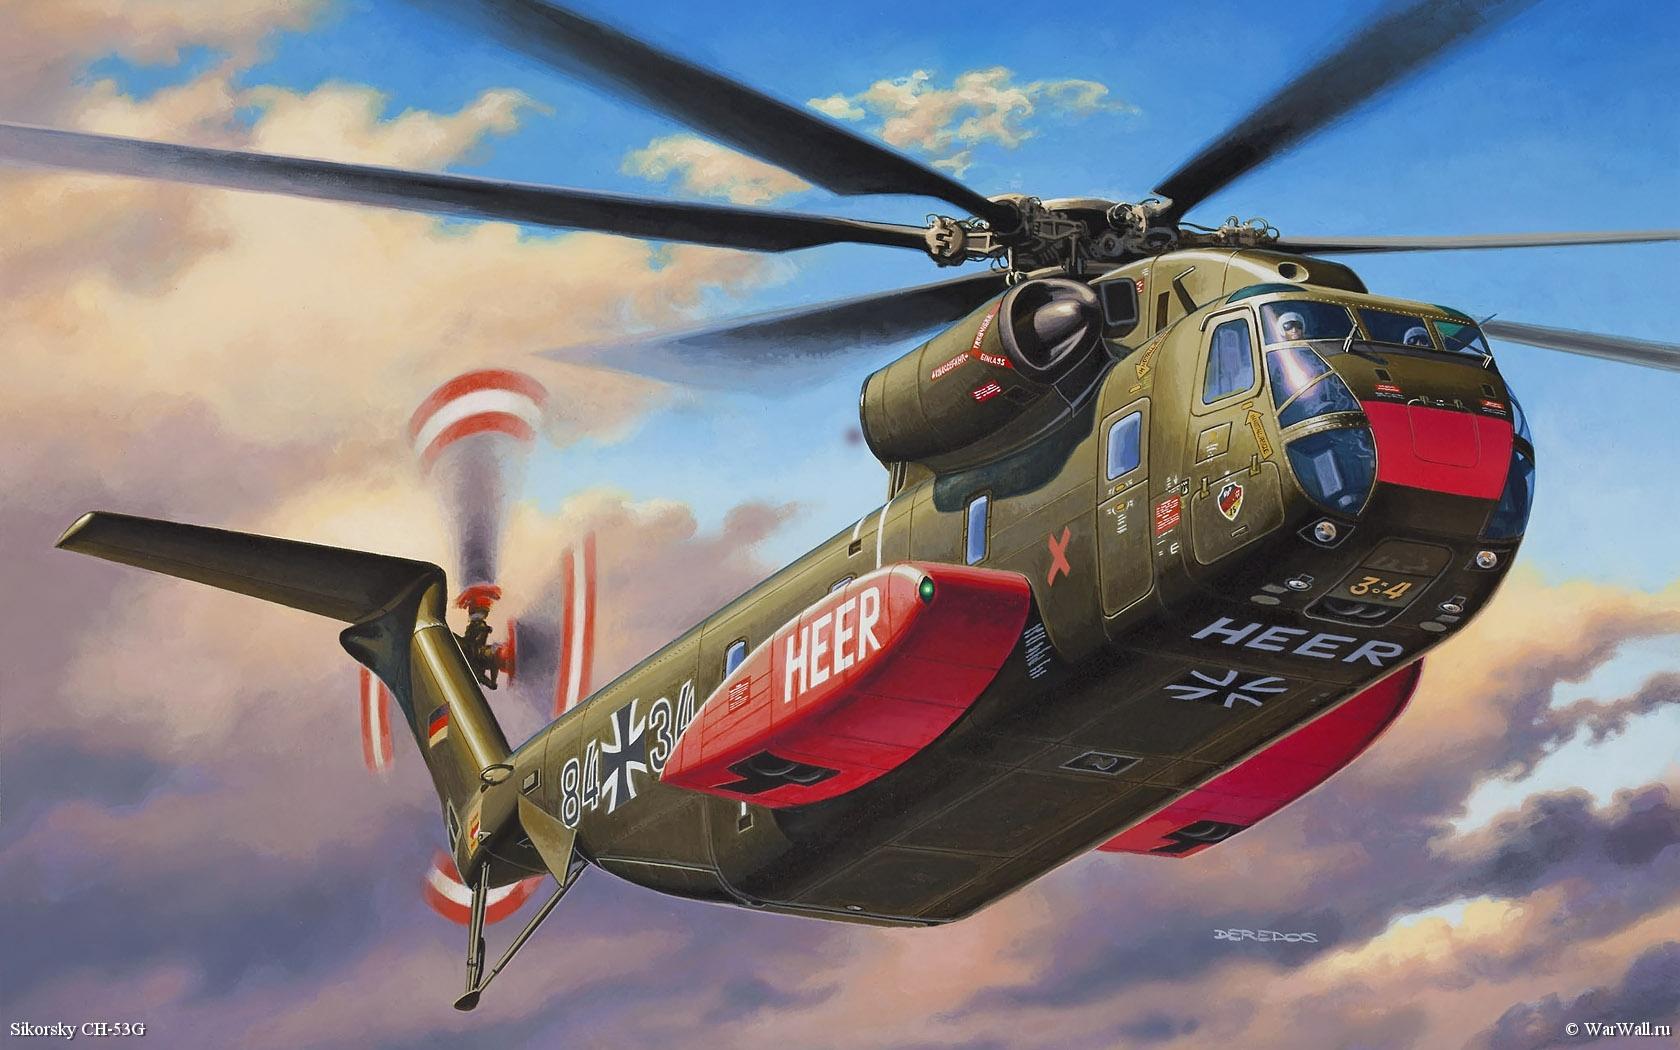 рисунок 04858 Sikorsky CH-53G